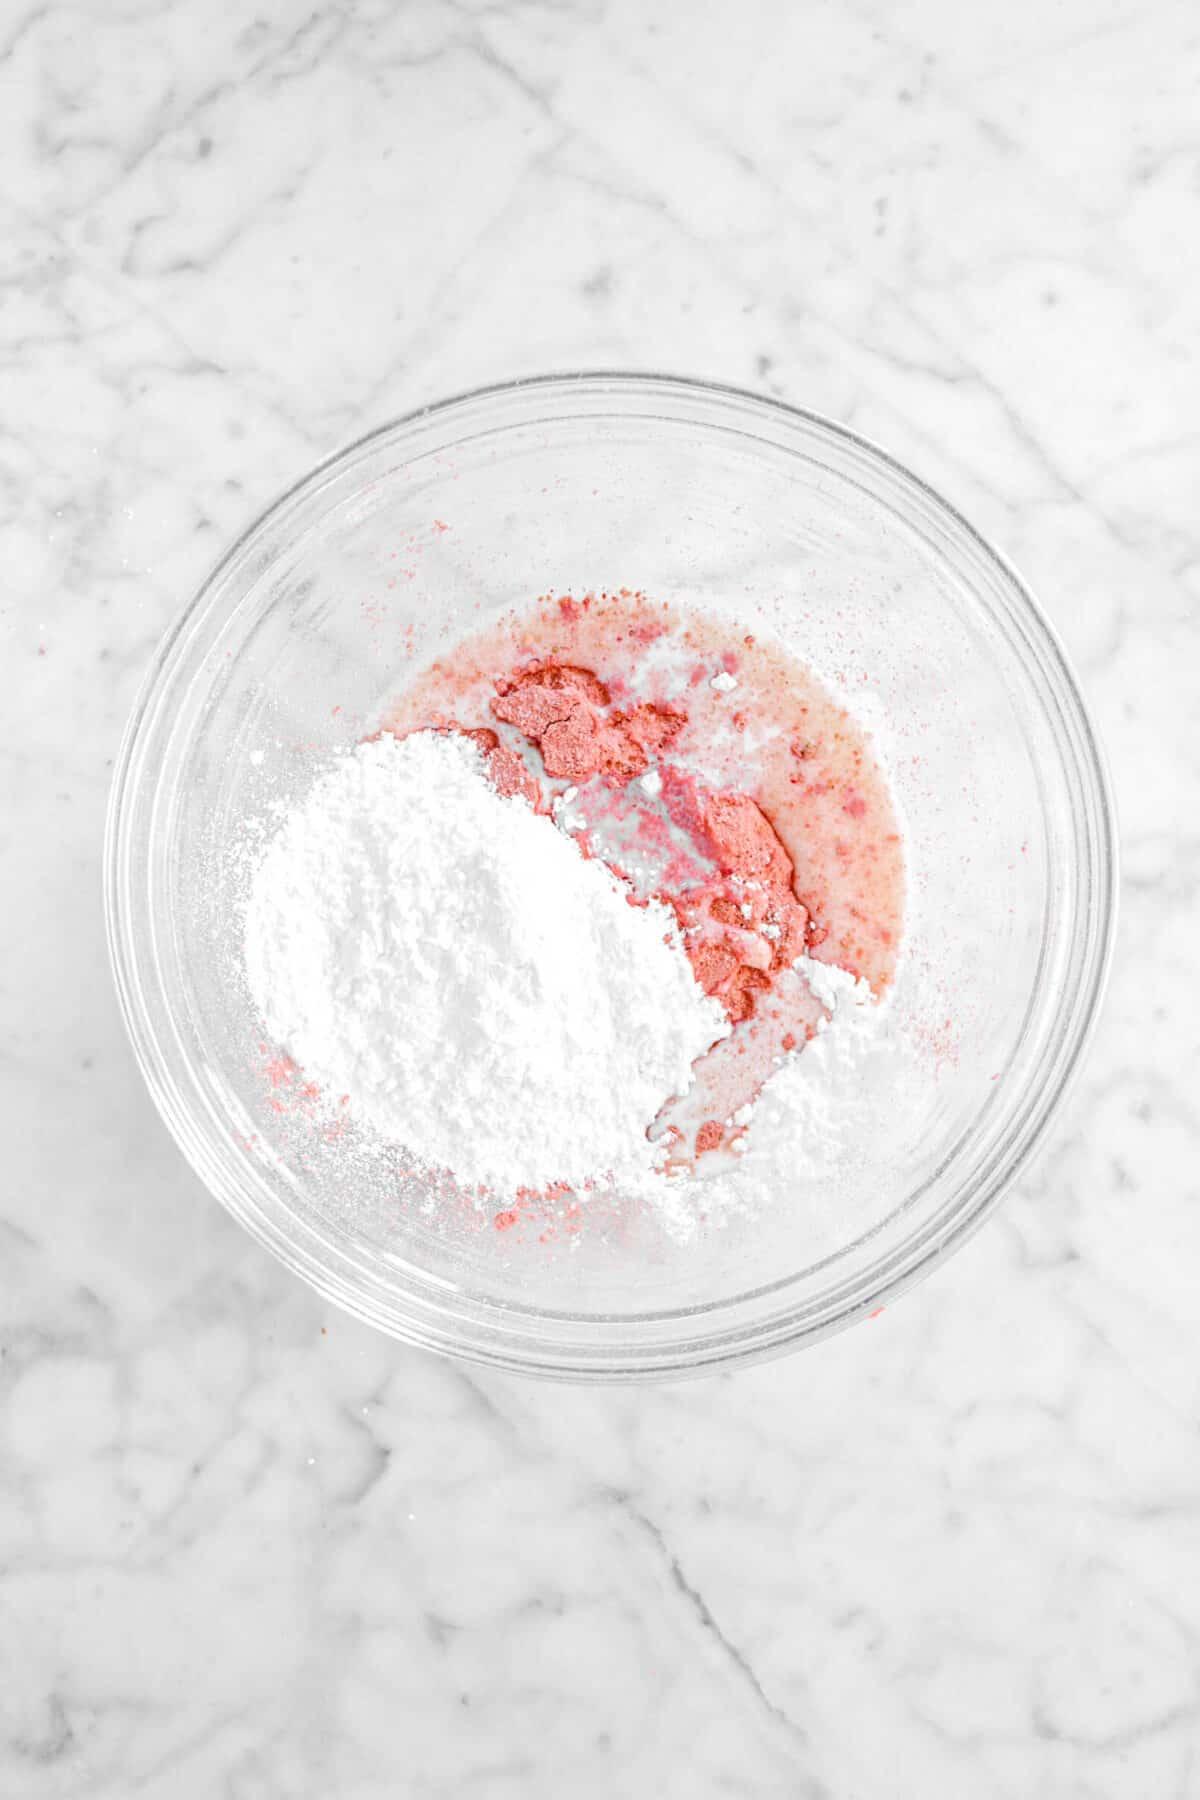 strawberry powder, milk, and powdered sugar in glass bowl